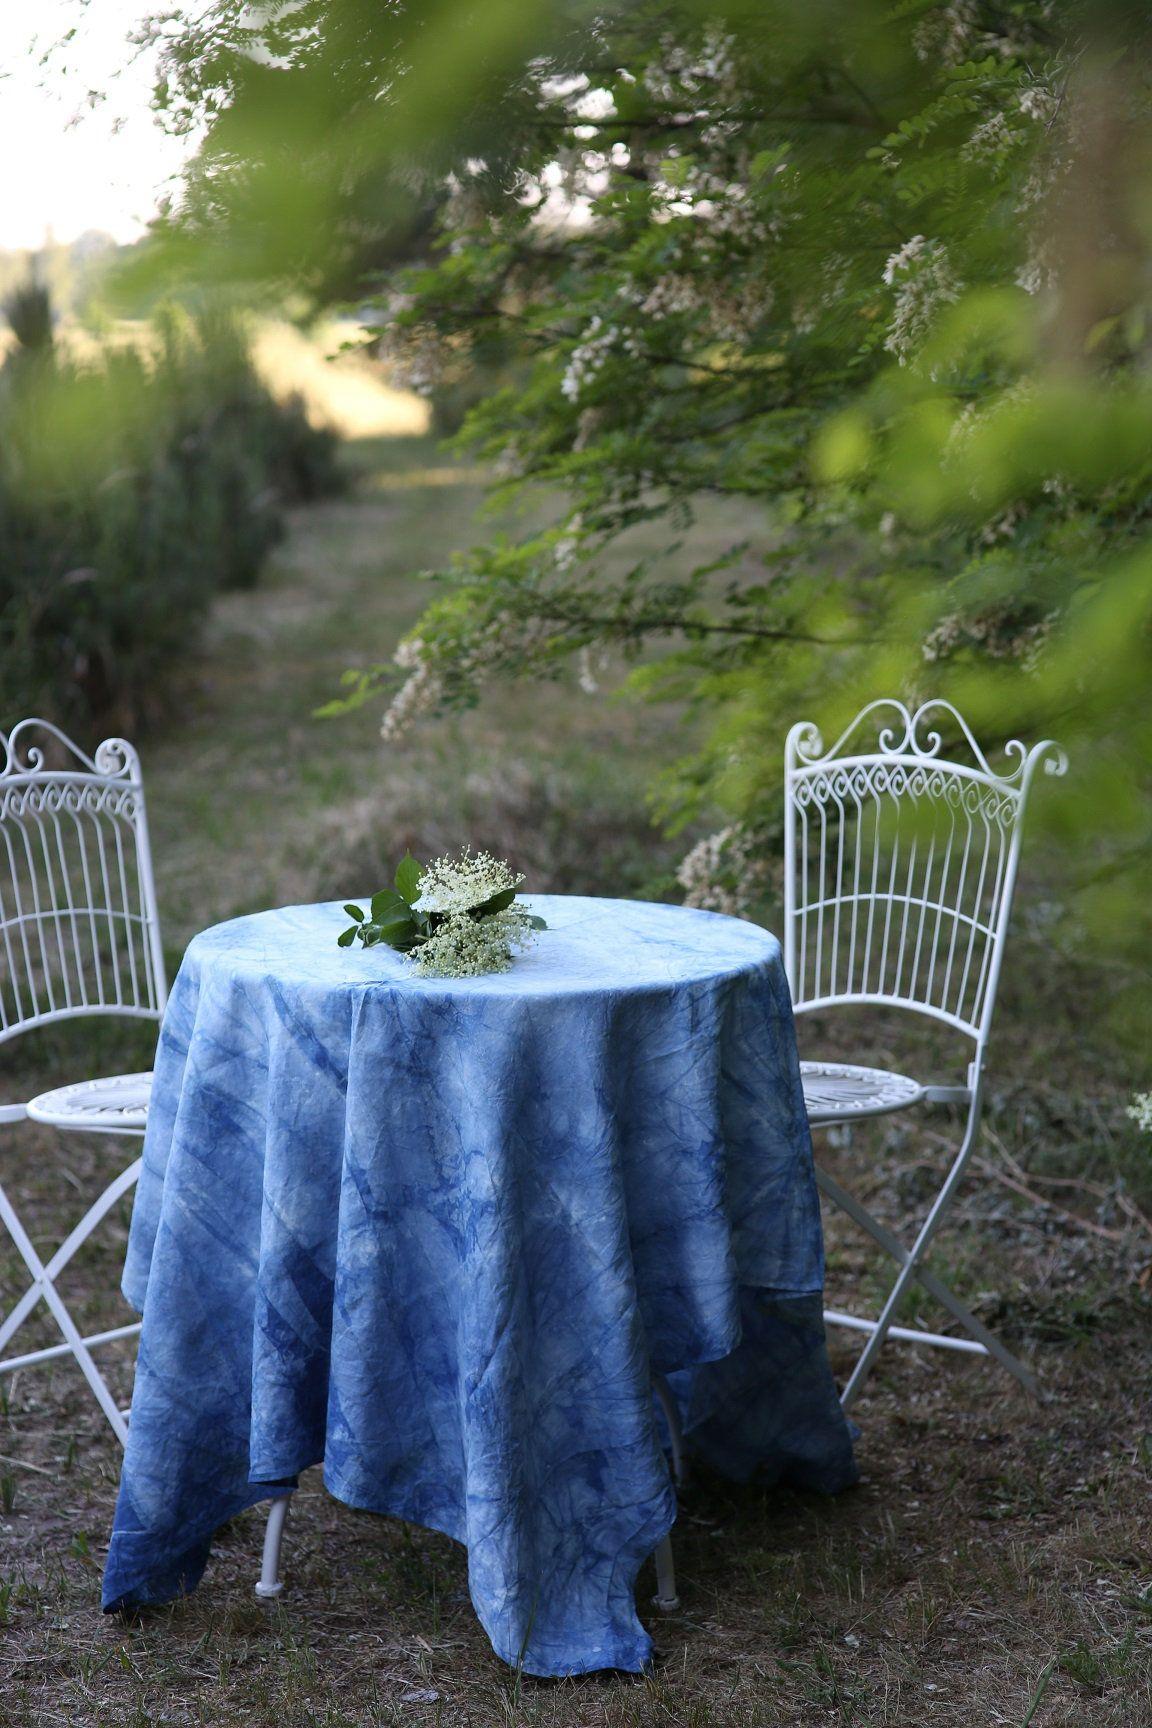 Linen Table Cloth Dining Tablecloth Blue Tablecloth Hand Dyed Indigo Farmhouse Tablecloth Burlap Table Cloth Tablecloth Rectangle Blue Tablecloth Farmhouse Tablecloths Hand Dyed Indigo